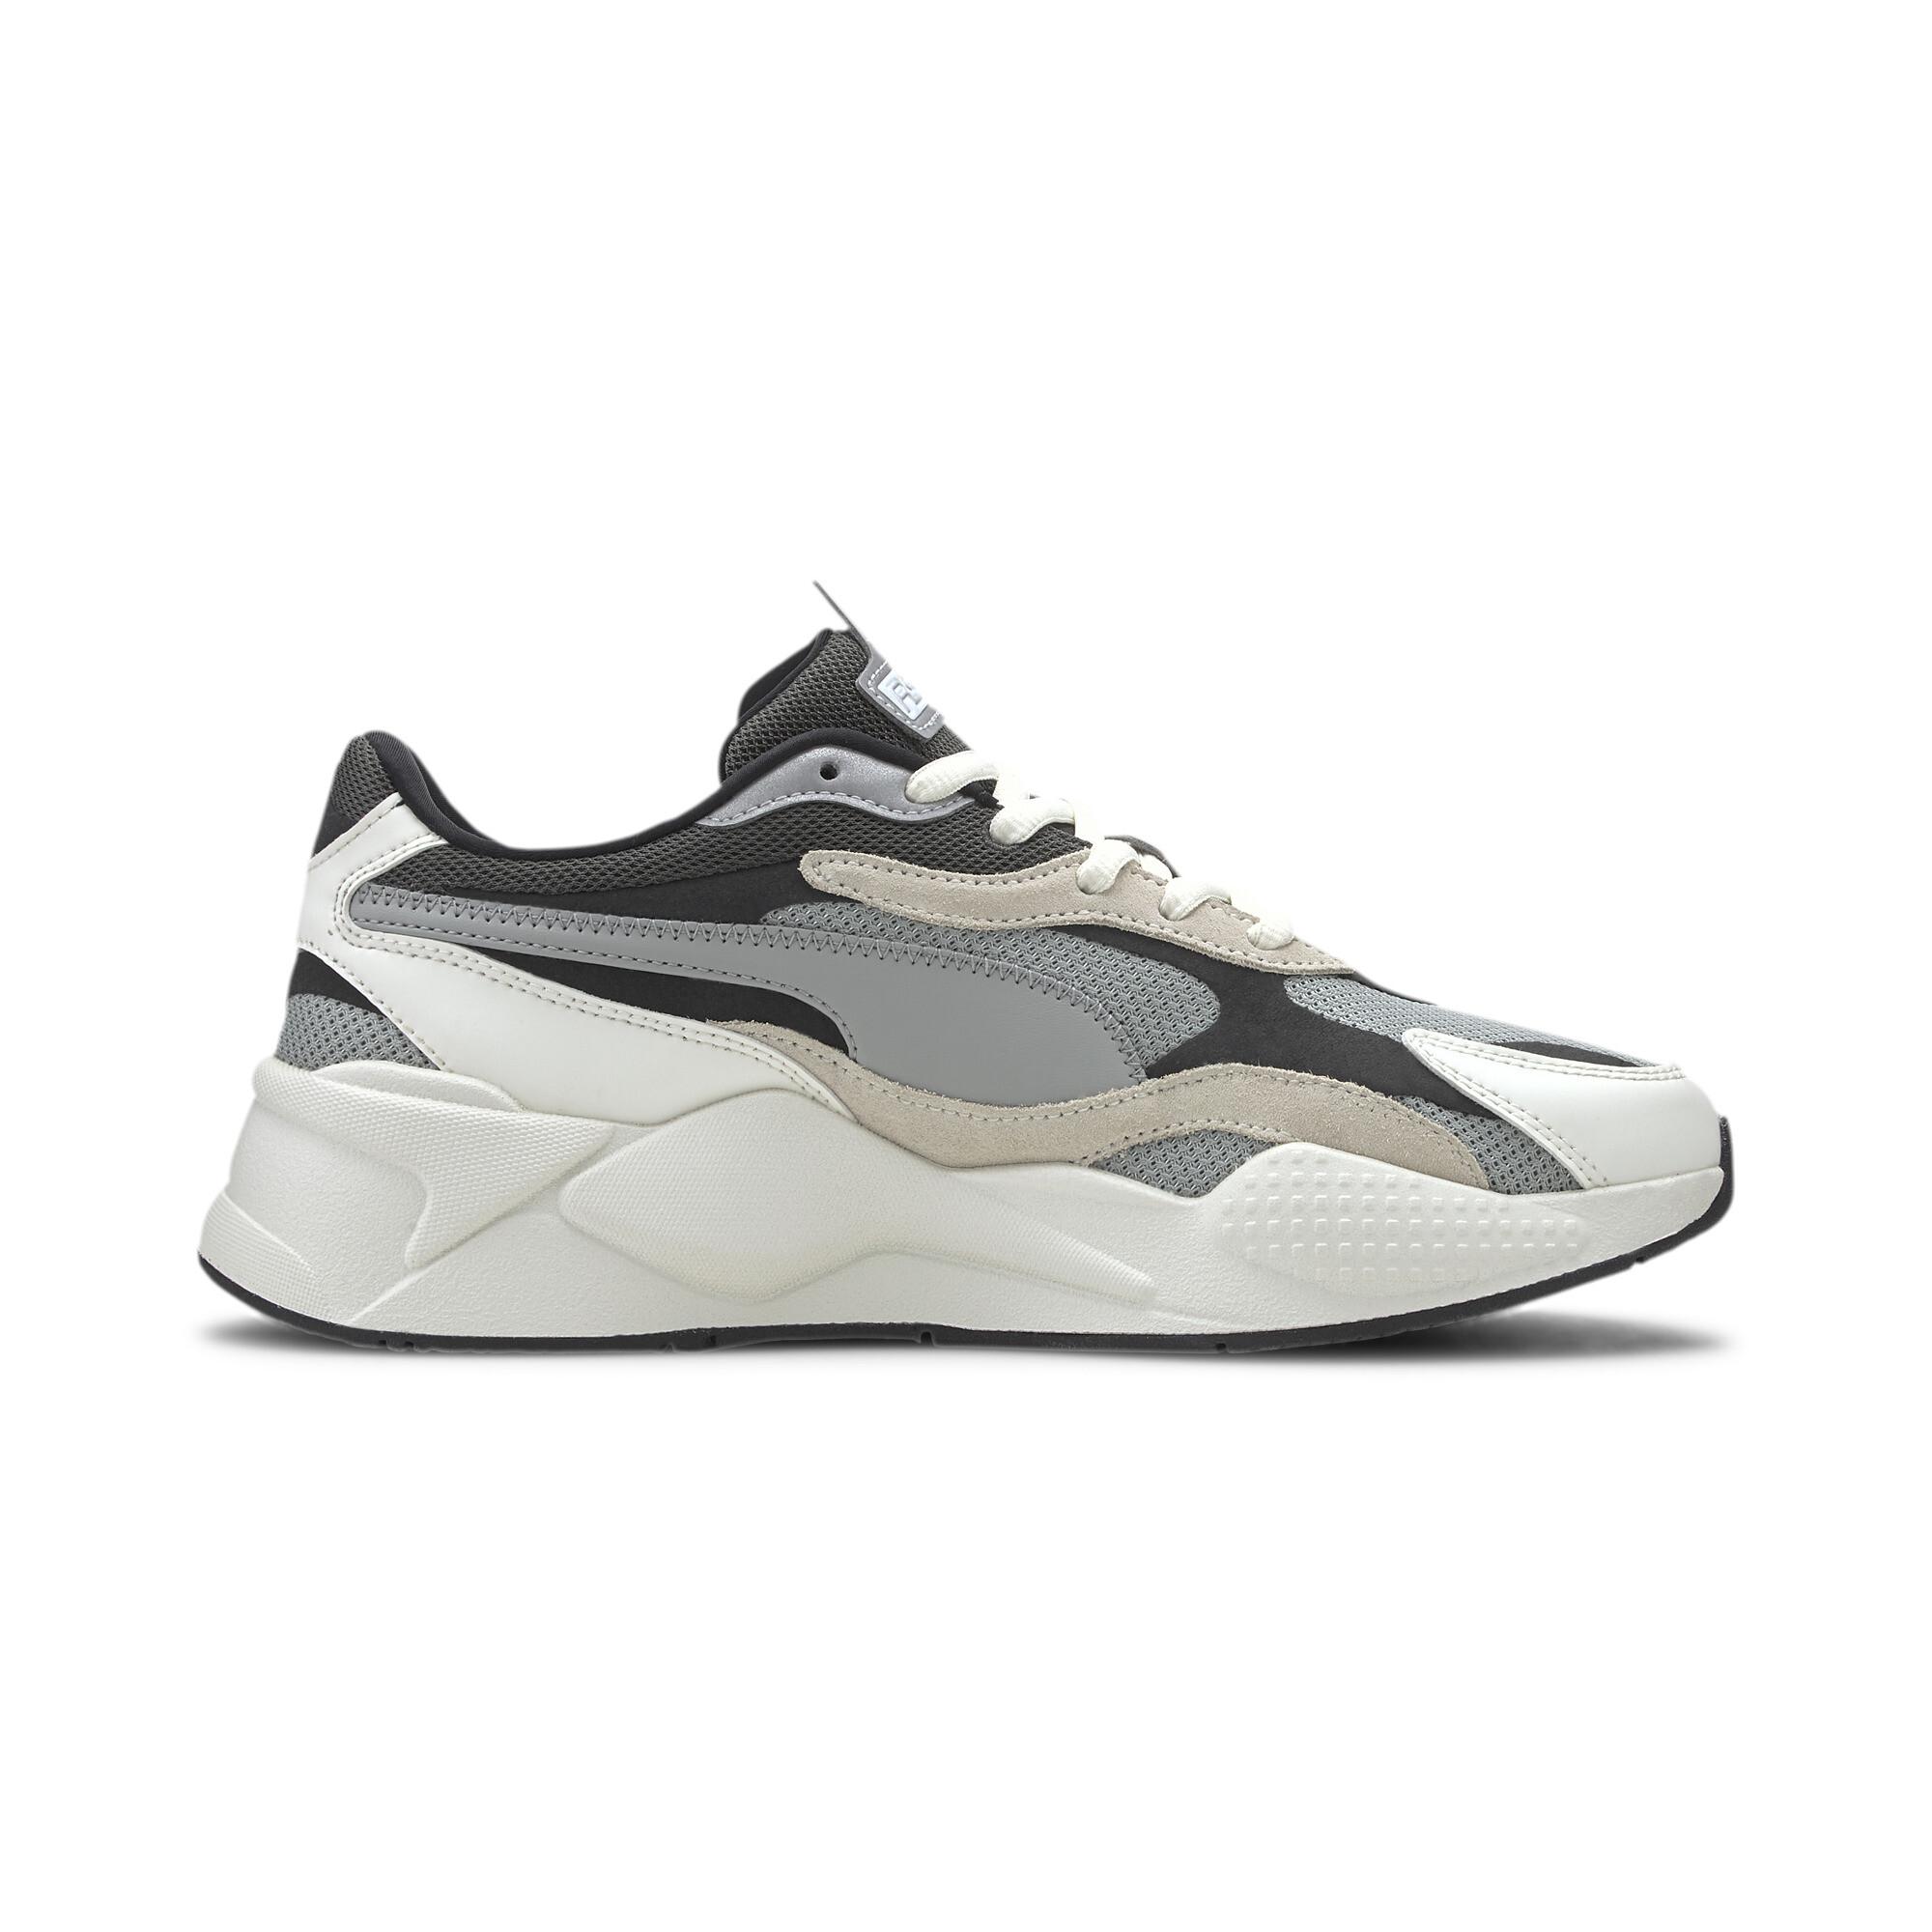 PUMA-Men-039-s-RS-X-Puzzle-Sneakers thumbnail 13